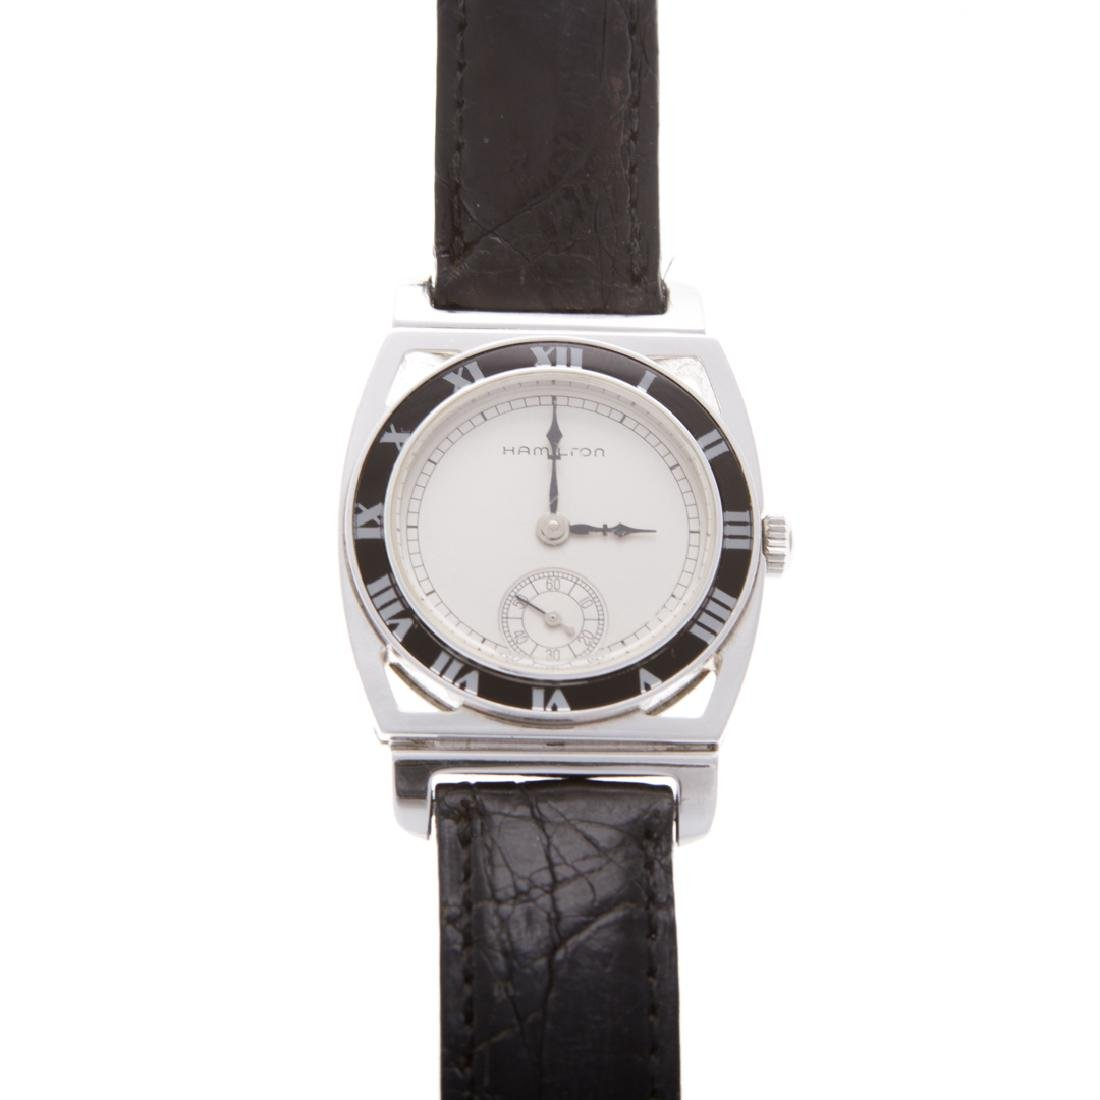 A Hamilton 1928 Yankees World Champion Watch